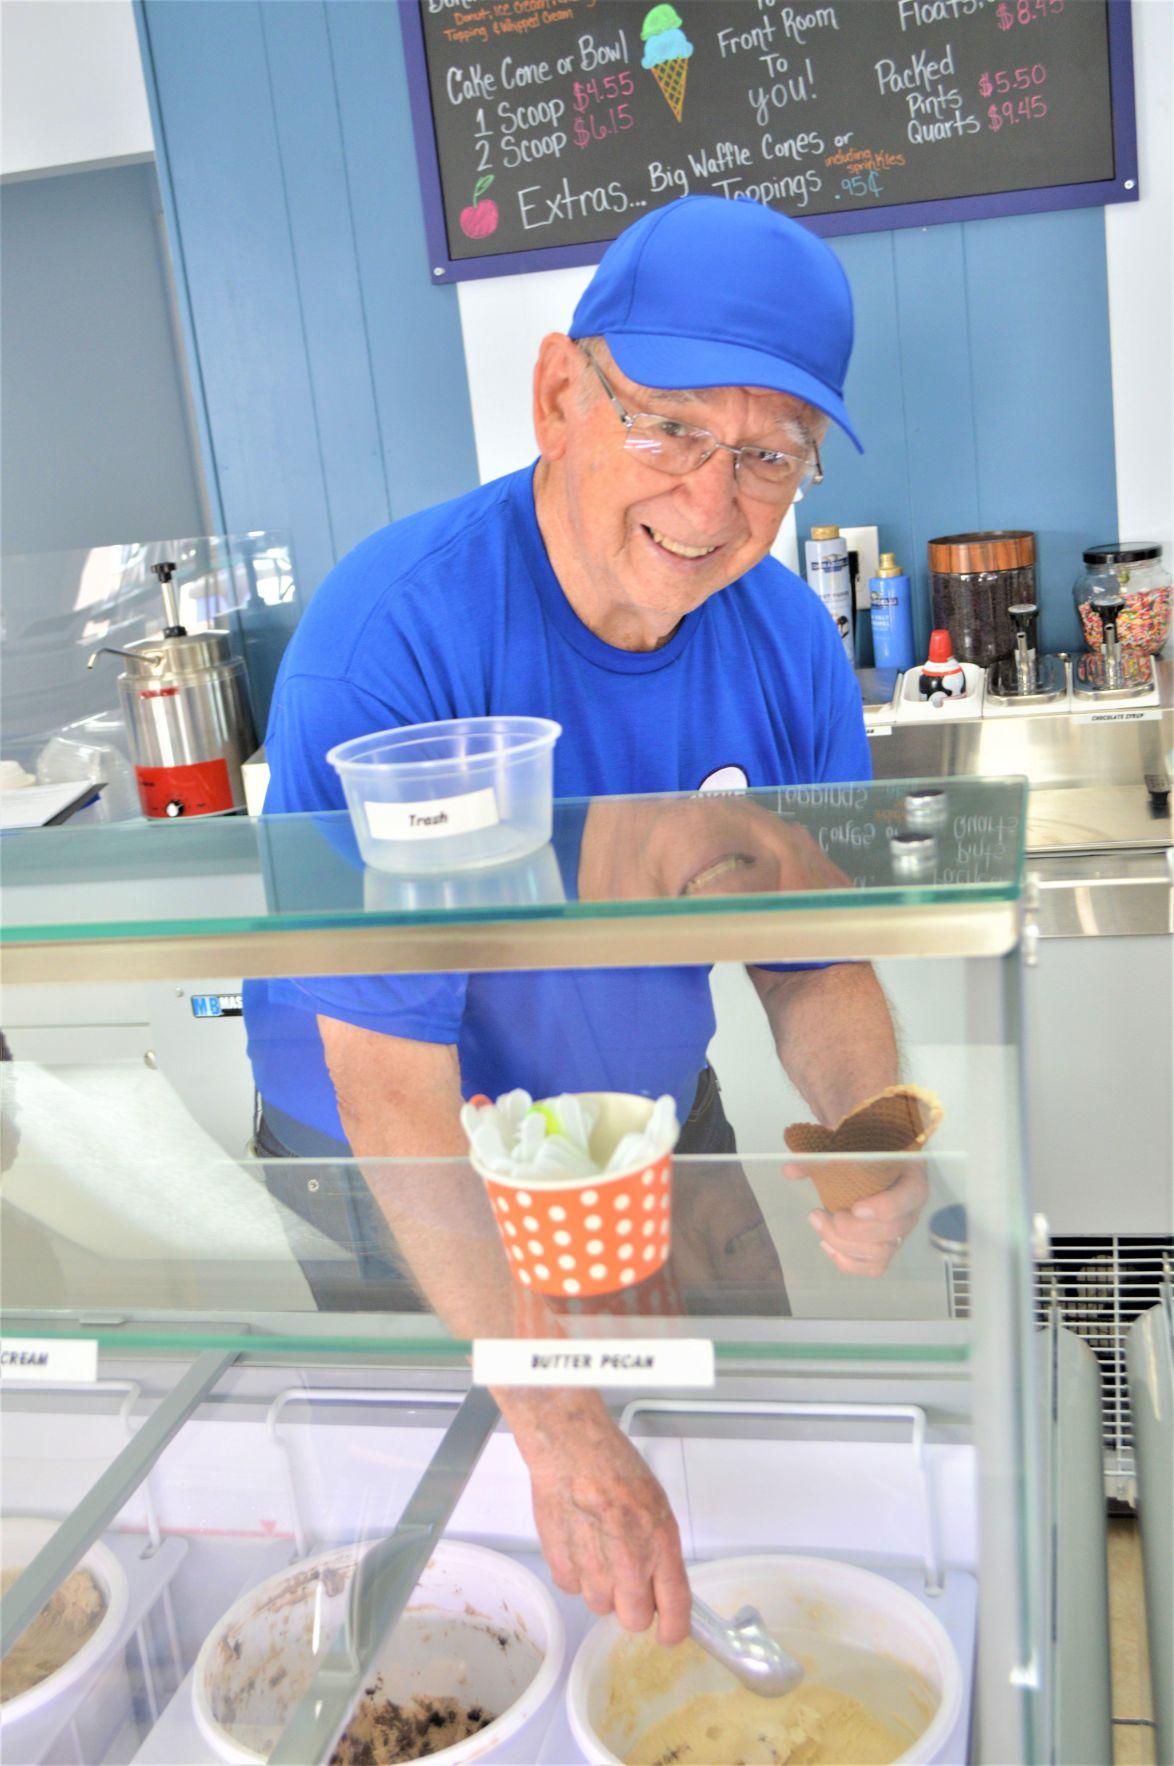 Siesta Creamery offers traditional ice cream with original recipes